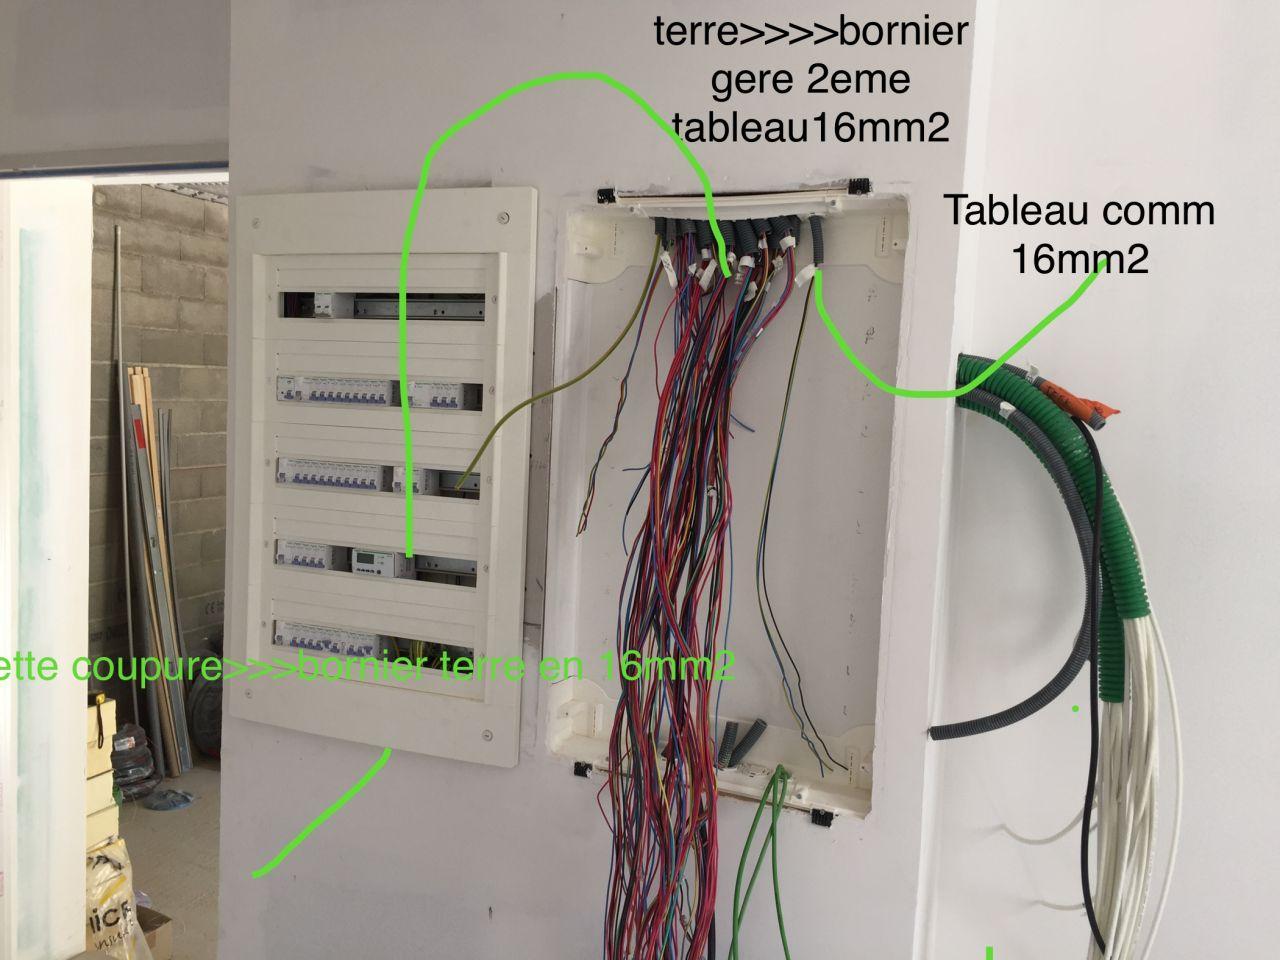 2 tableaux electrique et vdi terre r solu 7 messages. Black Bedroom Furniture Sets. Home Design Ideas